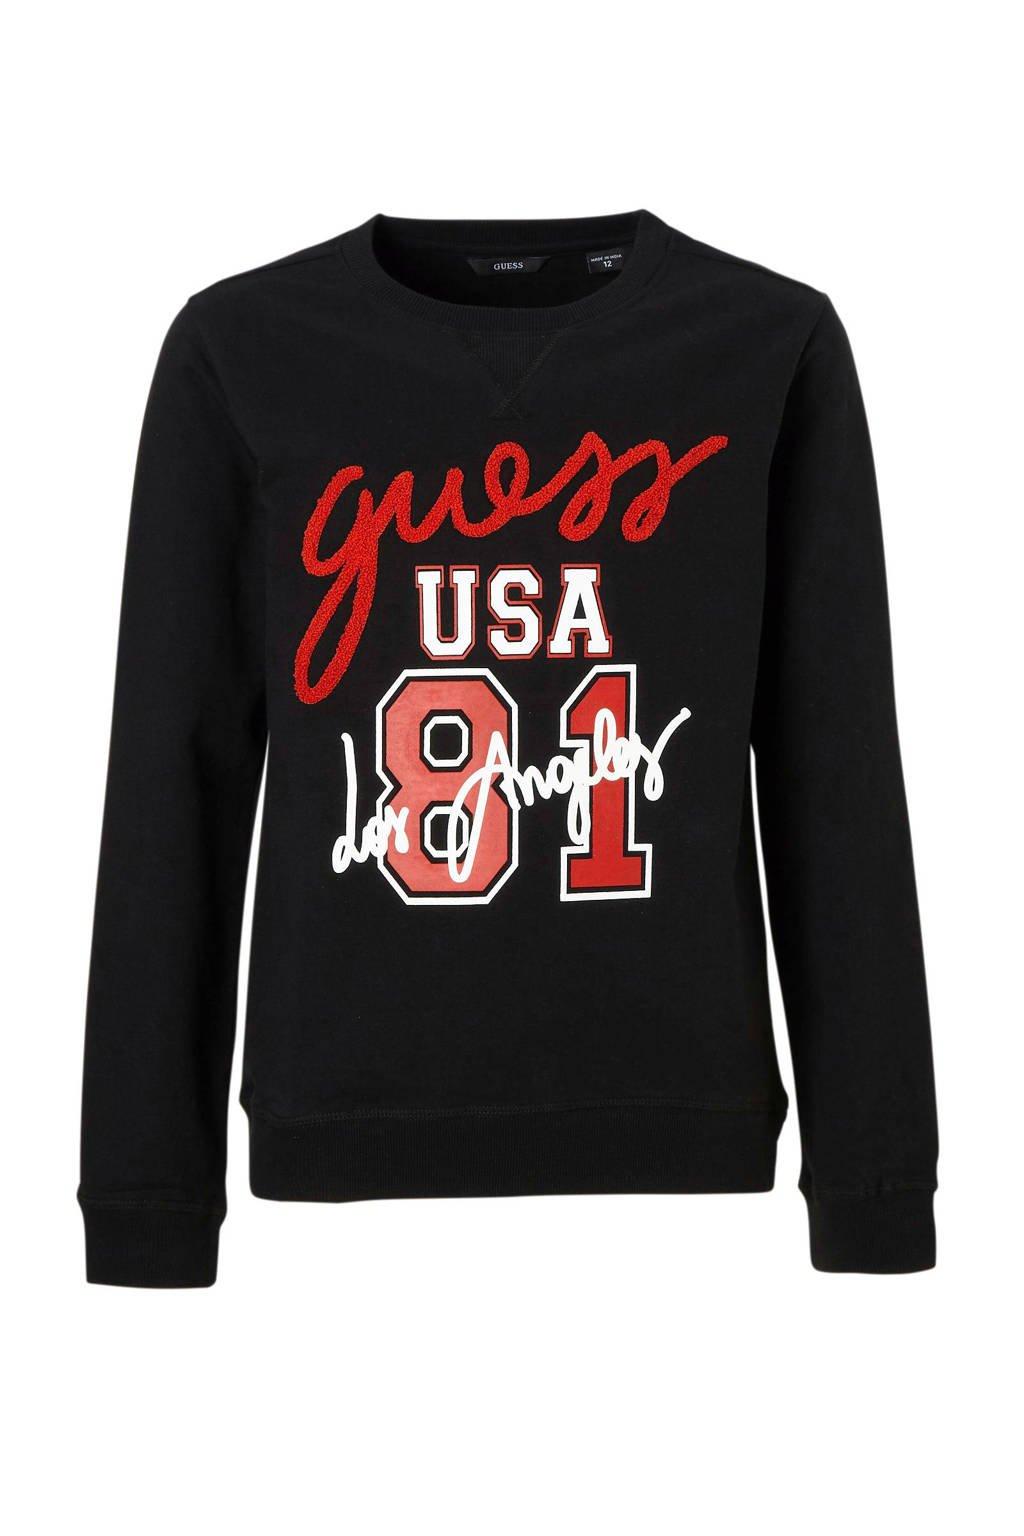 GUESS sweater met logo, Zwart